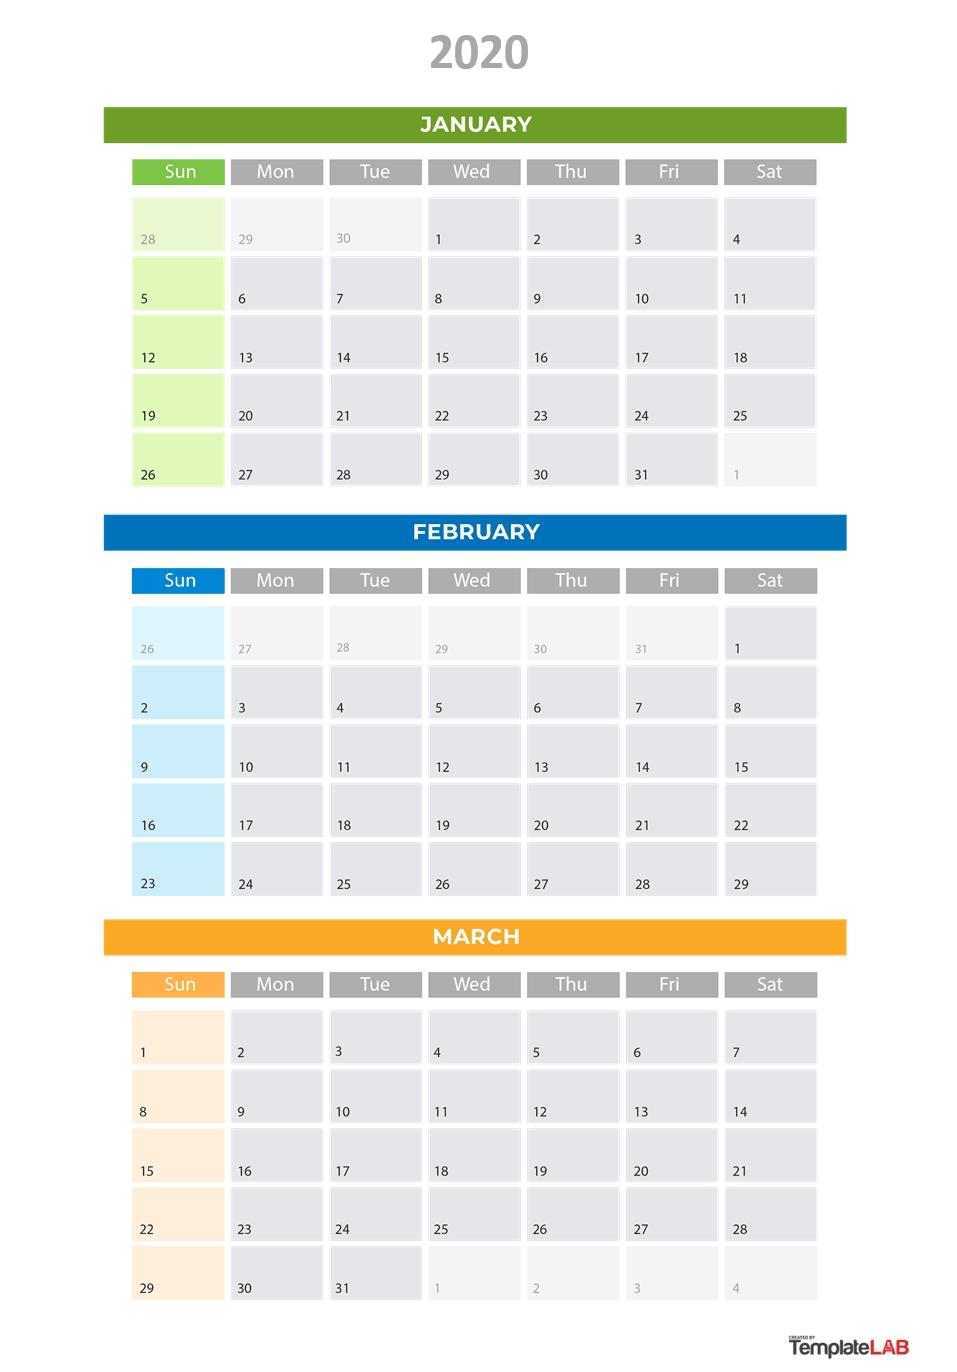 Quarterly Calendar 2020 Printable - Wpa.wpart.co-Blank 3 Month Calendar 2020 Printable